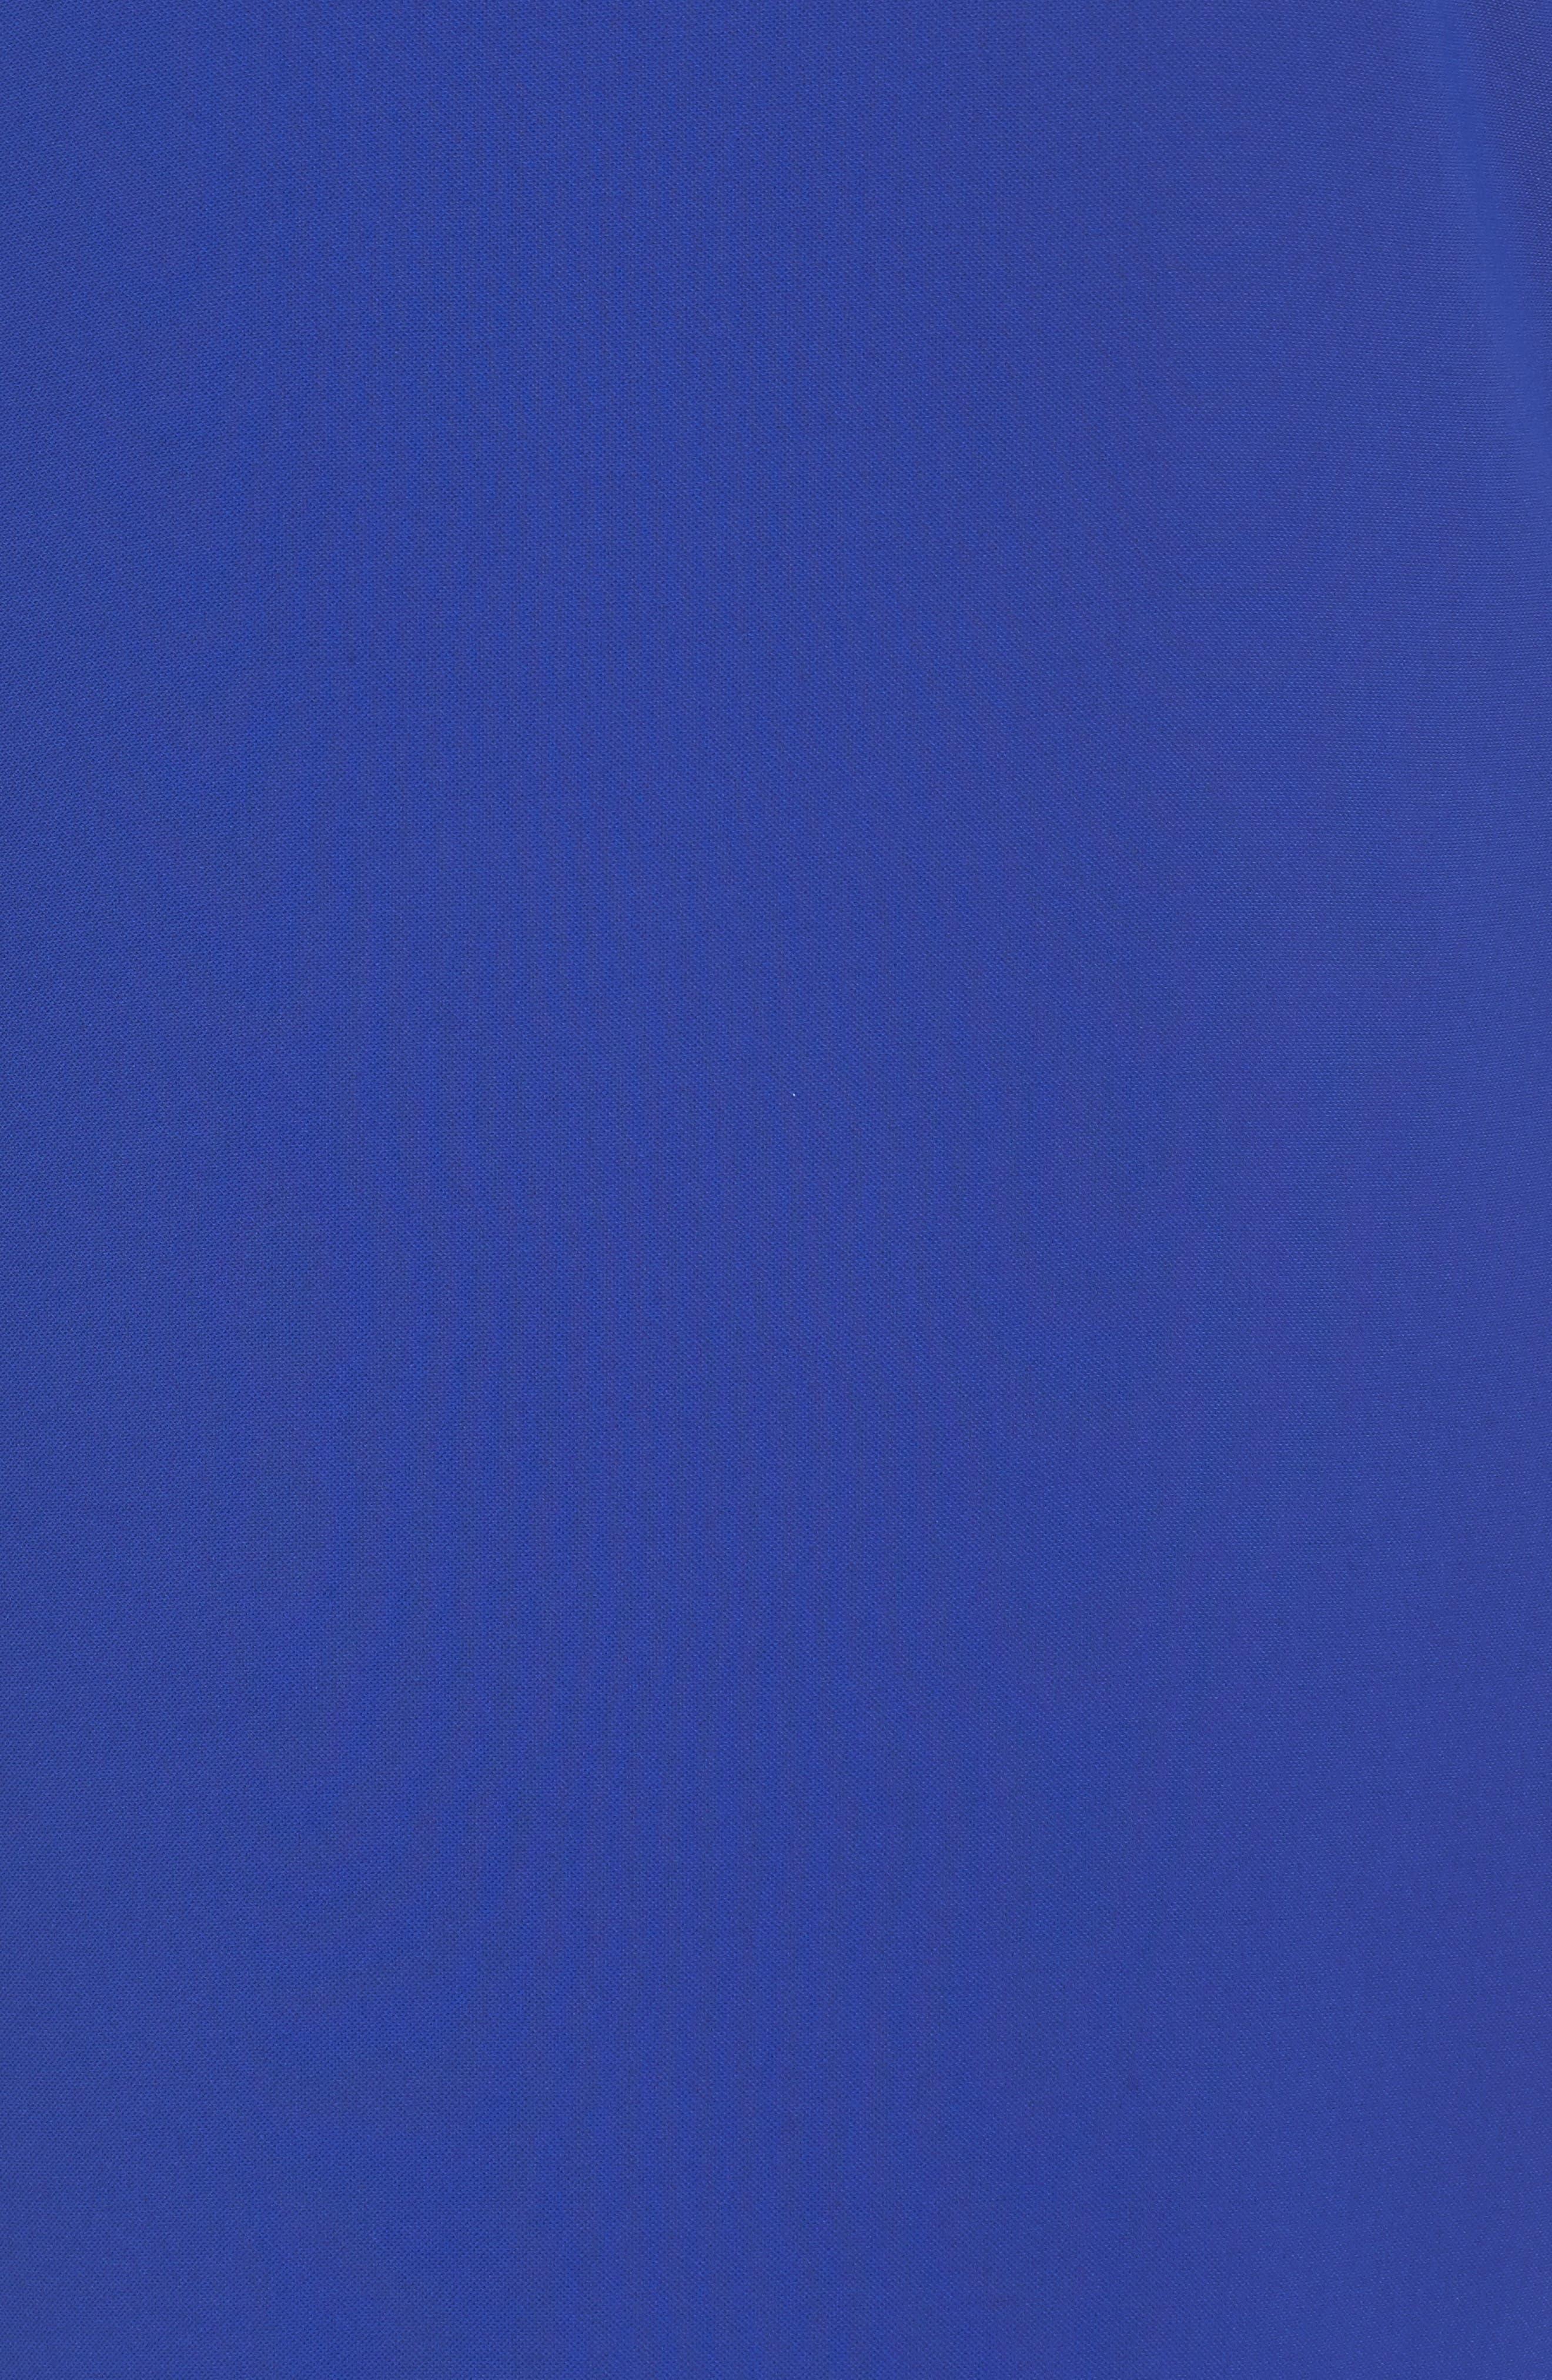 Ruffle Sleeve Crepe Shift Dress,                             Alternate thumbnail 5, color,                             Cool Violet